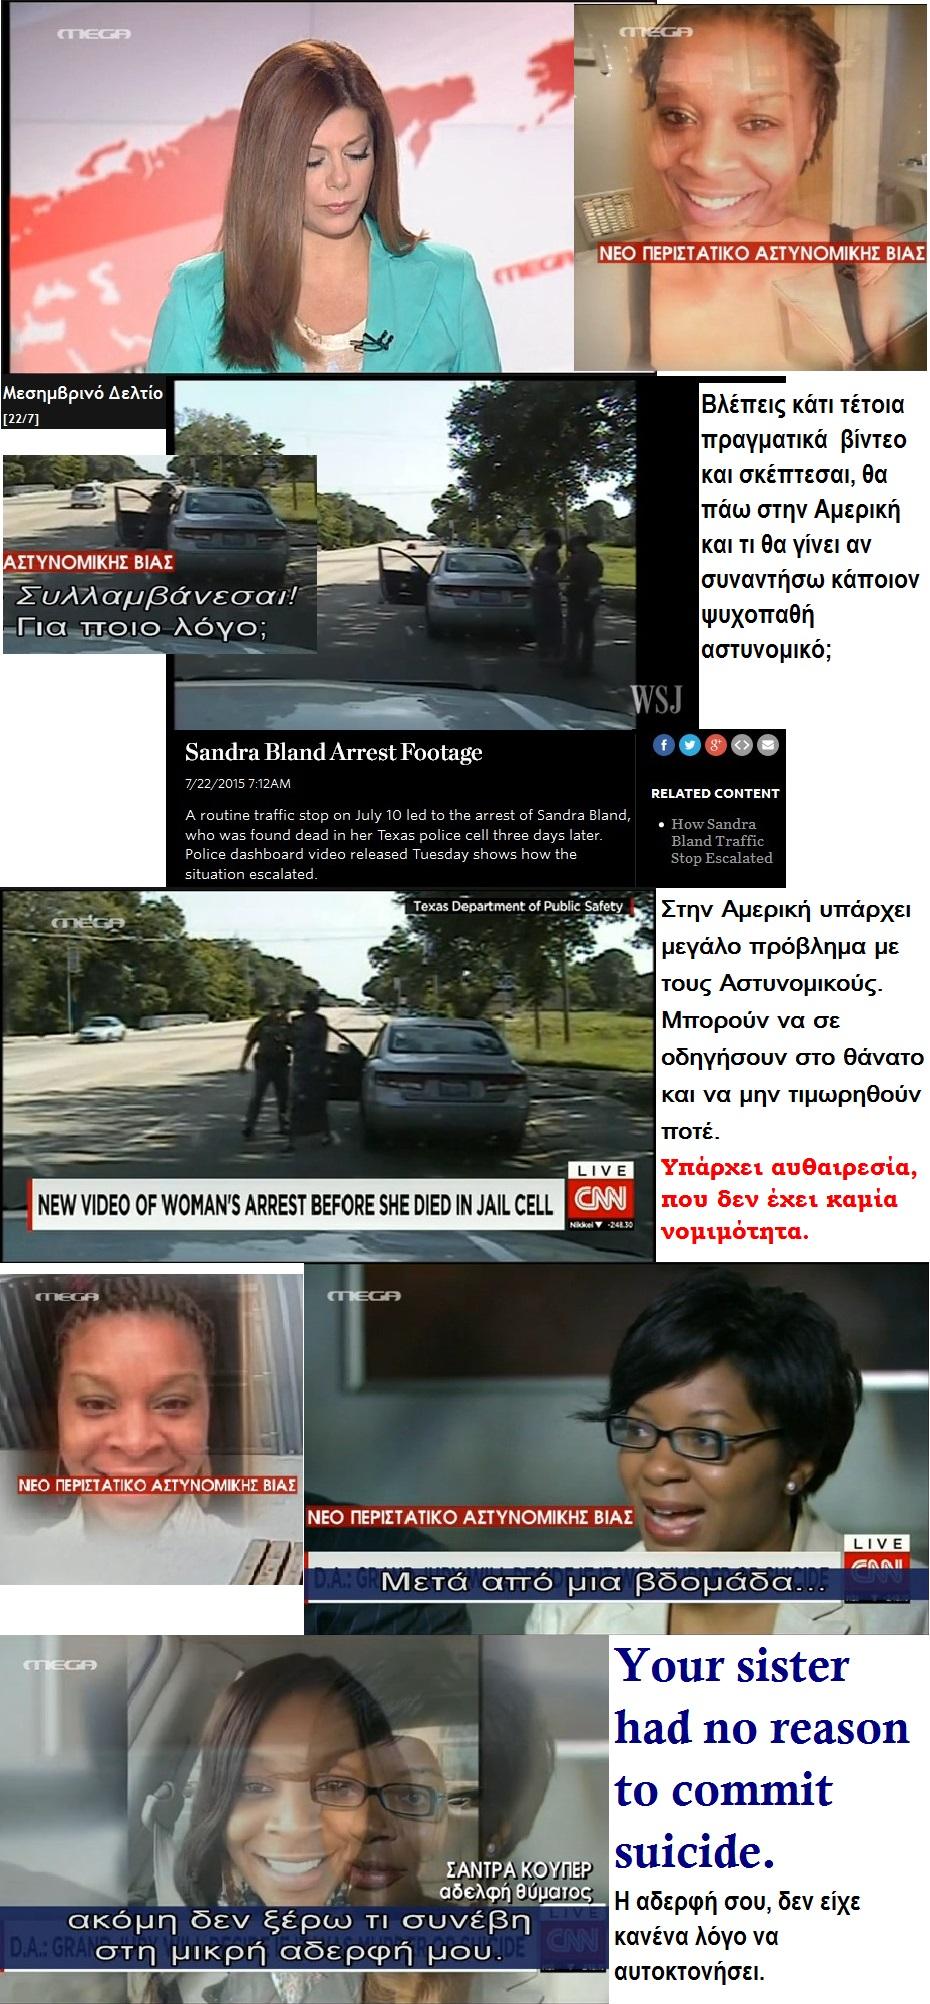 USA SANDRA BLAND DEAD ARREST FOOTAGE TEXAS POLICE 03 230715